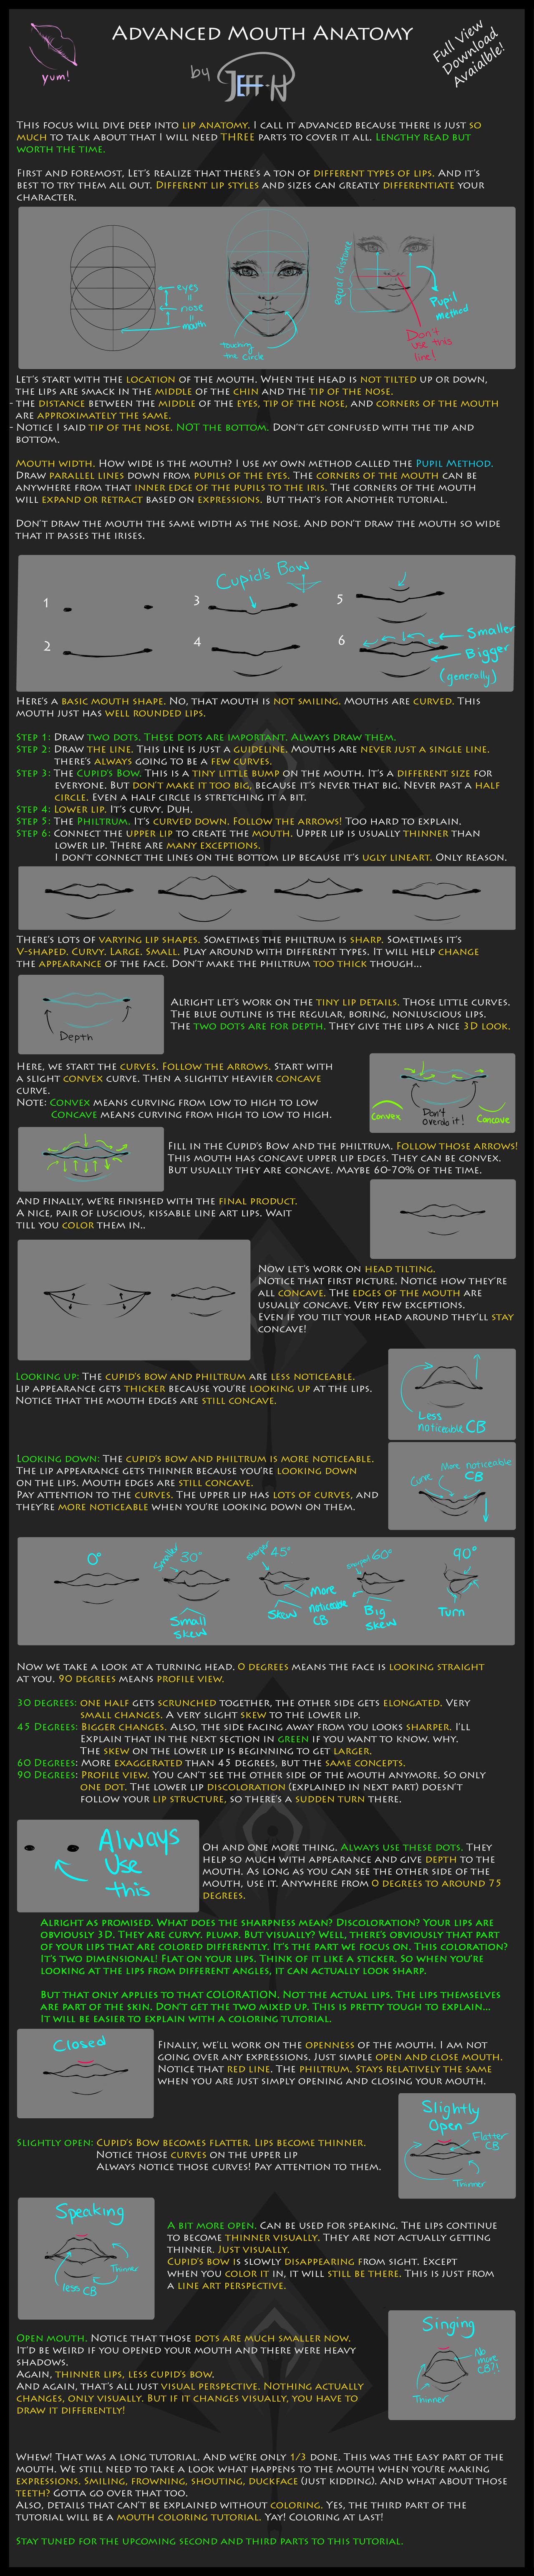 Advanced Mouth Anatomy Tutorial - Part 1